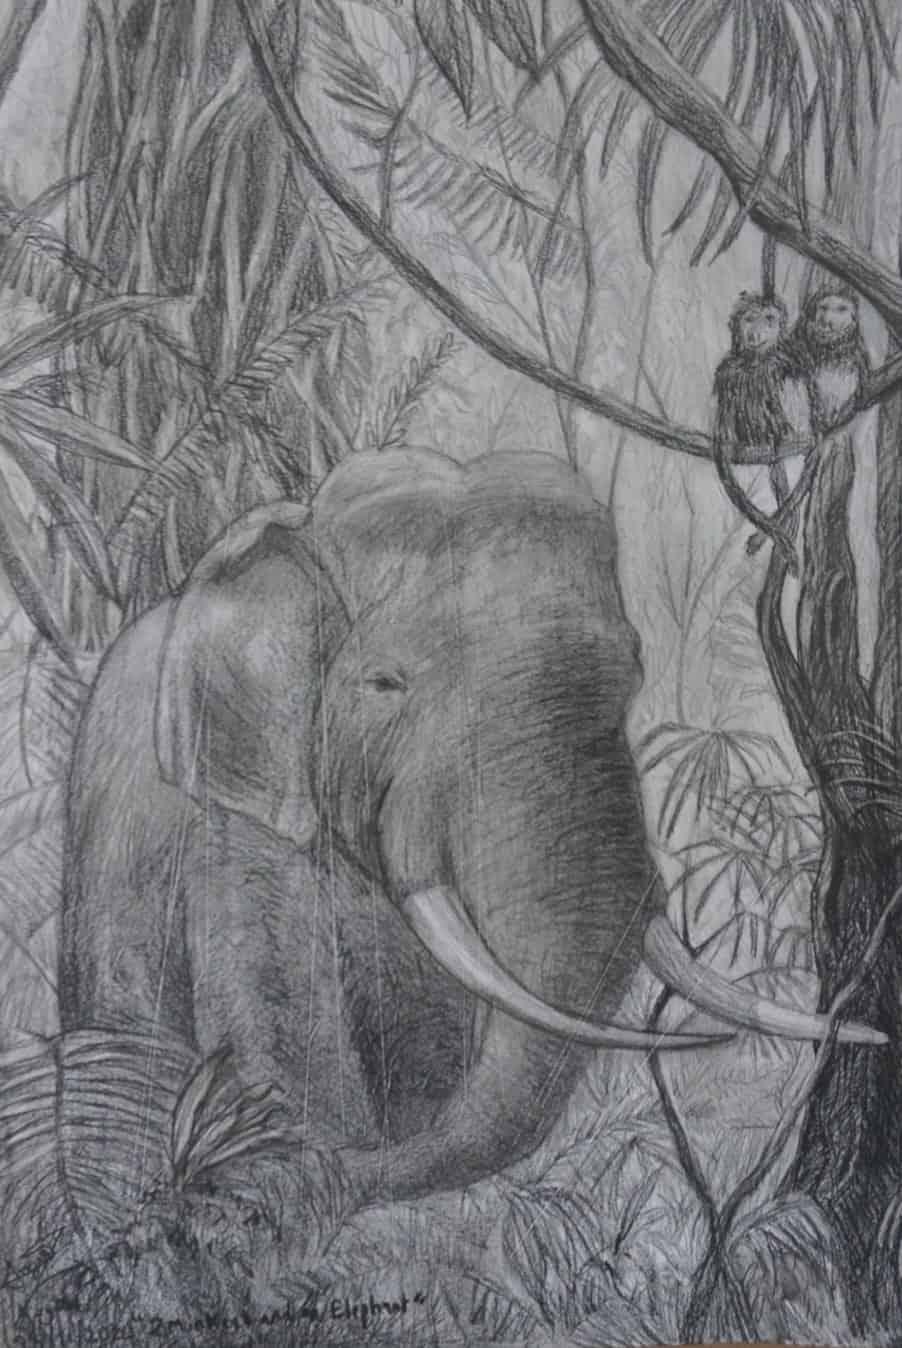 #4 2 Monkeys and an Elephant (Aged 12)